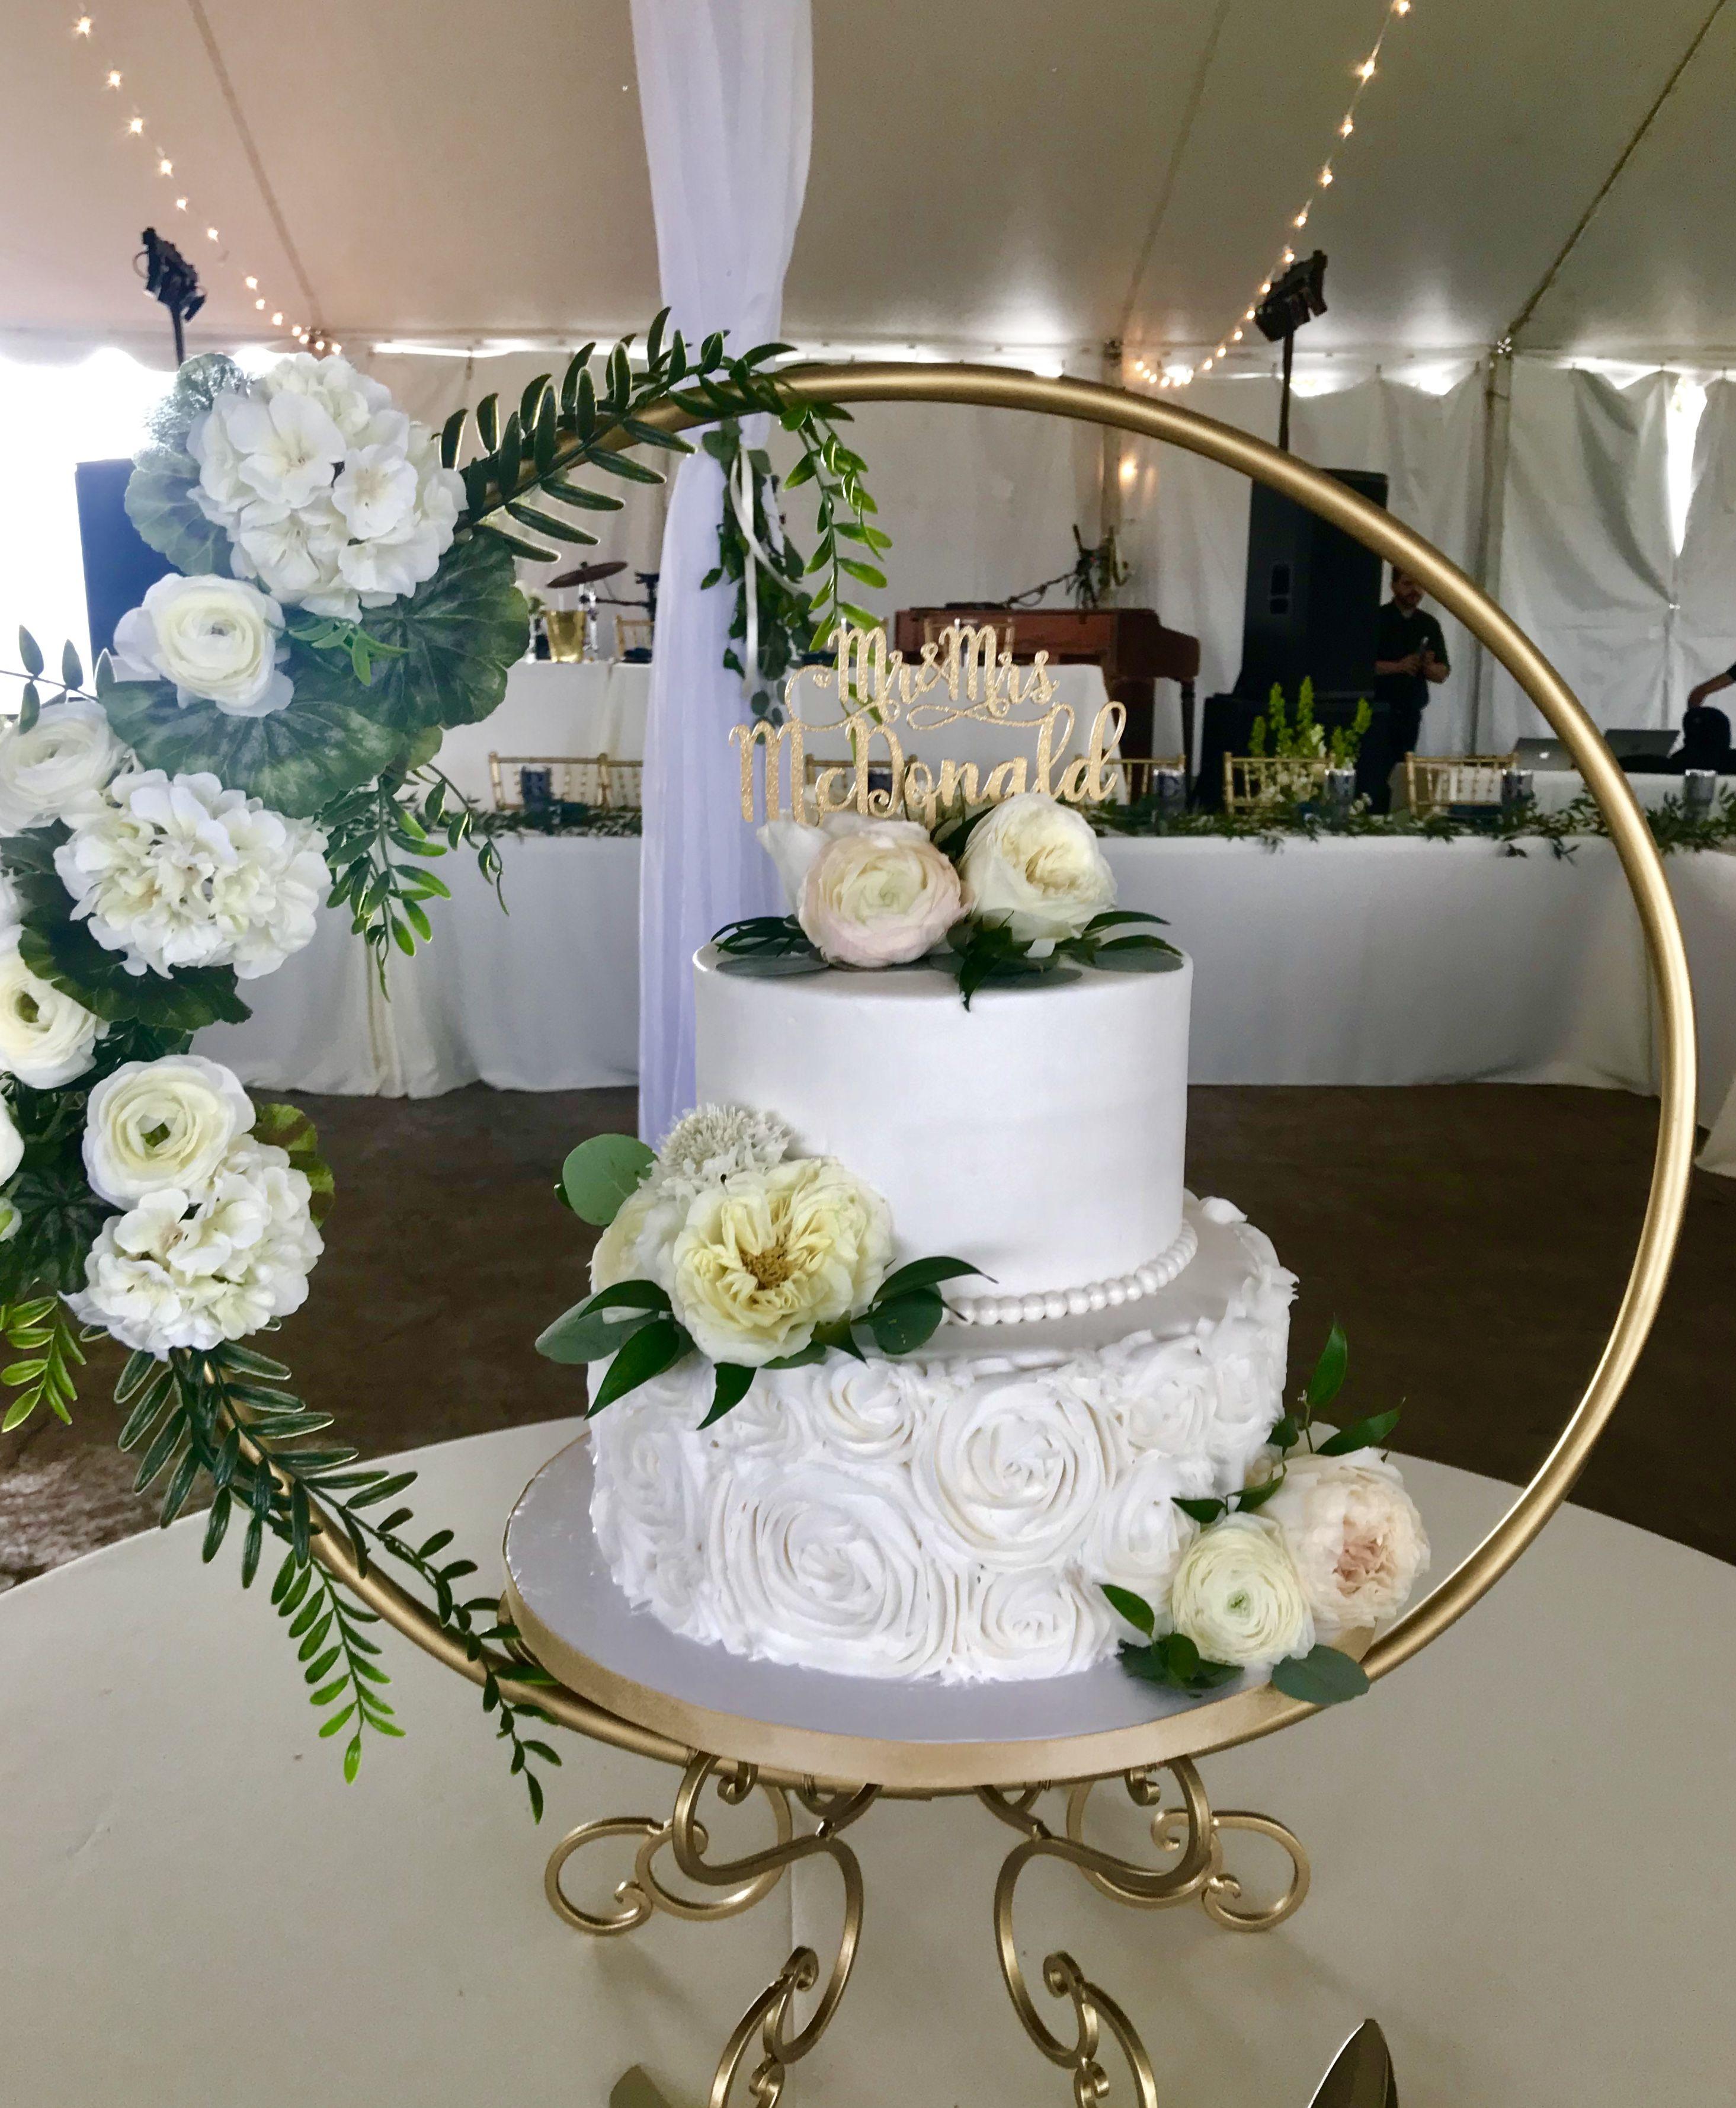 Beautiful white wedding cake with greenery and white